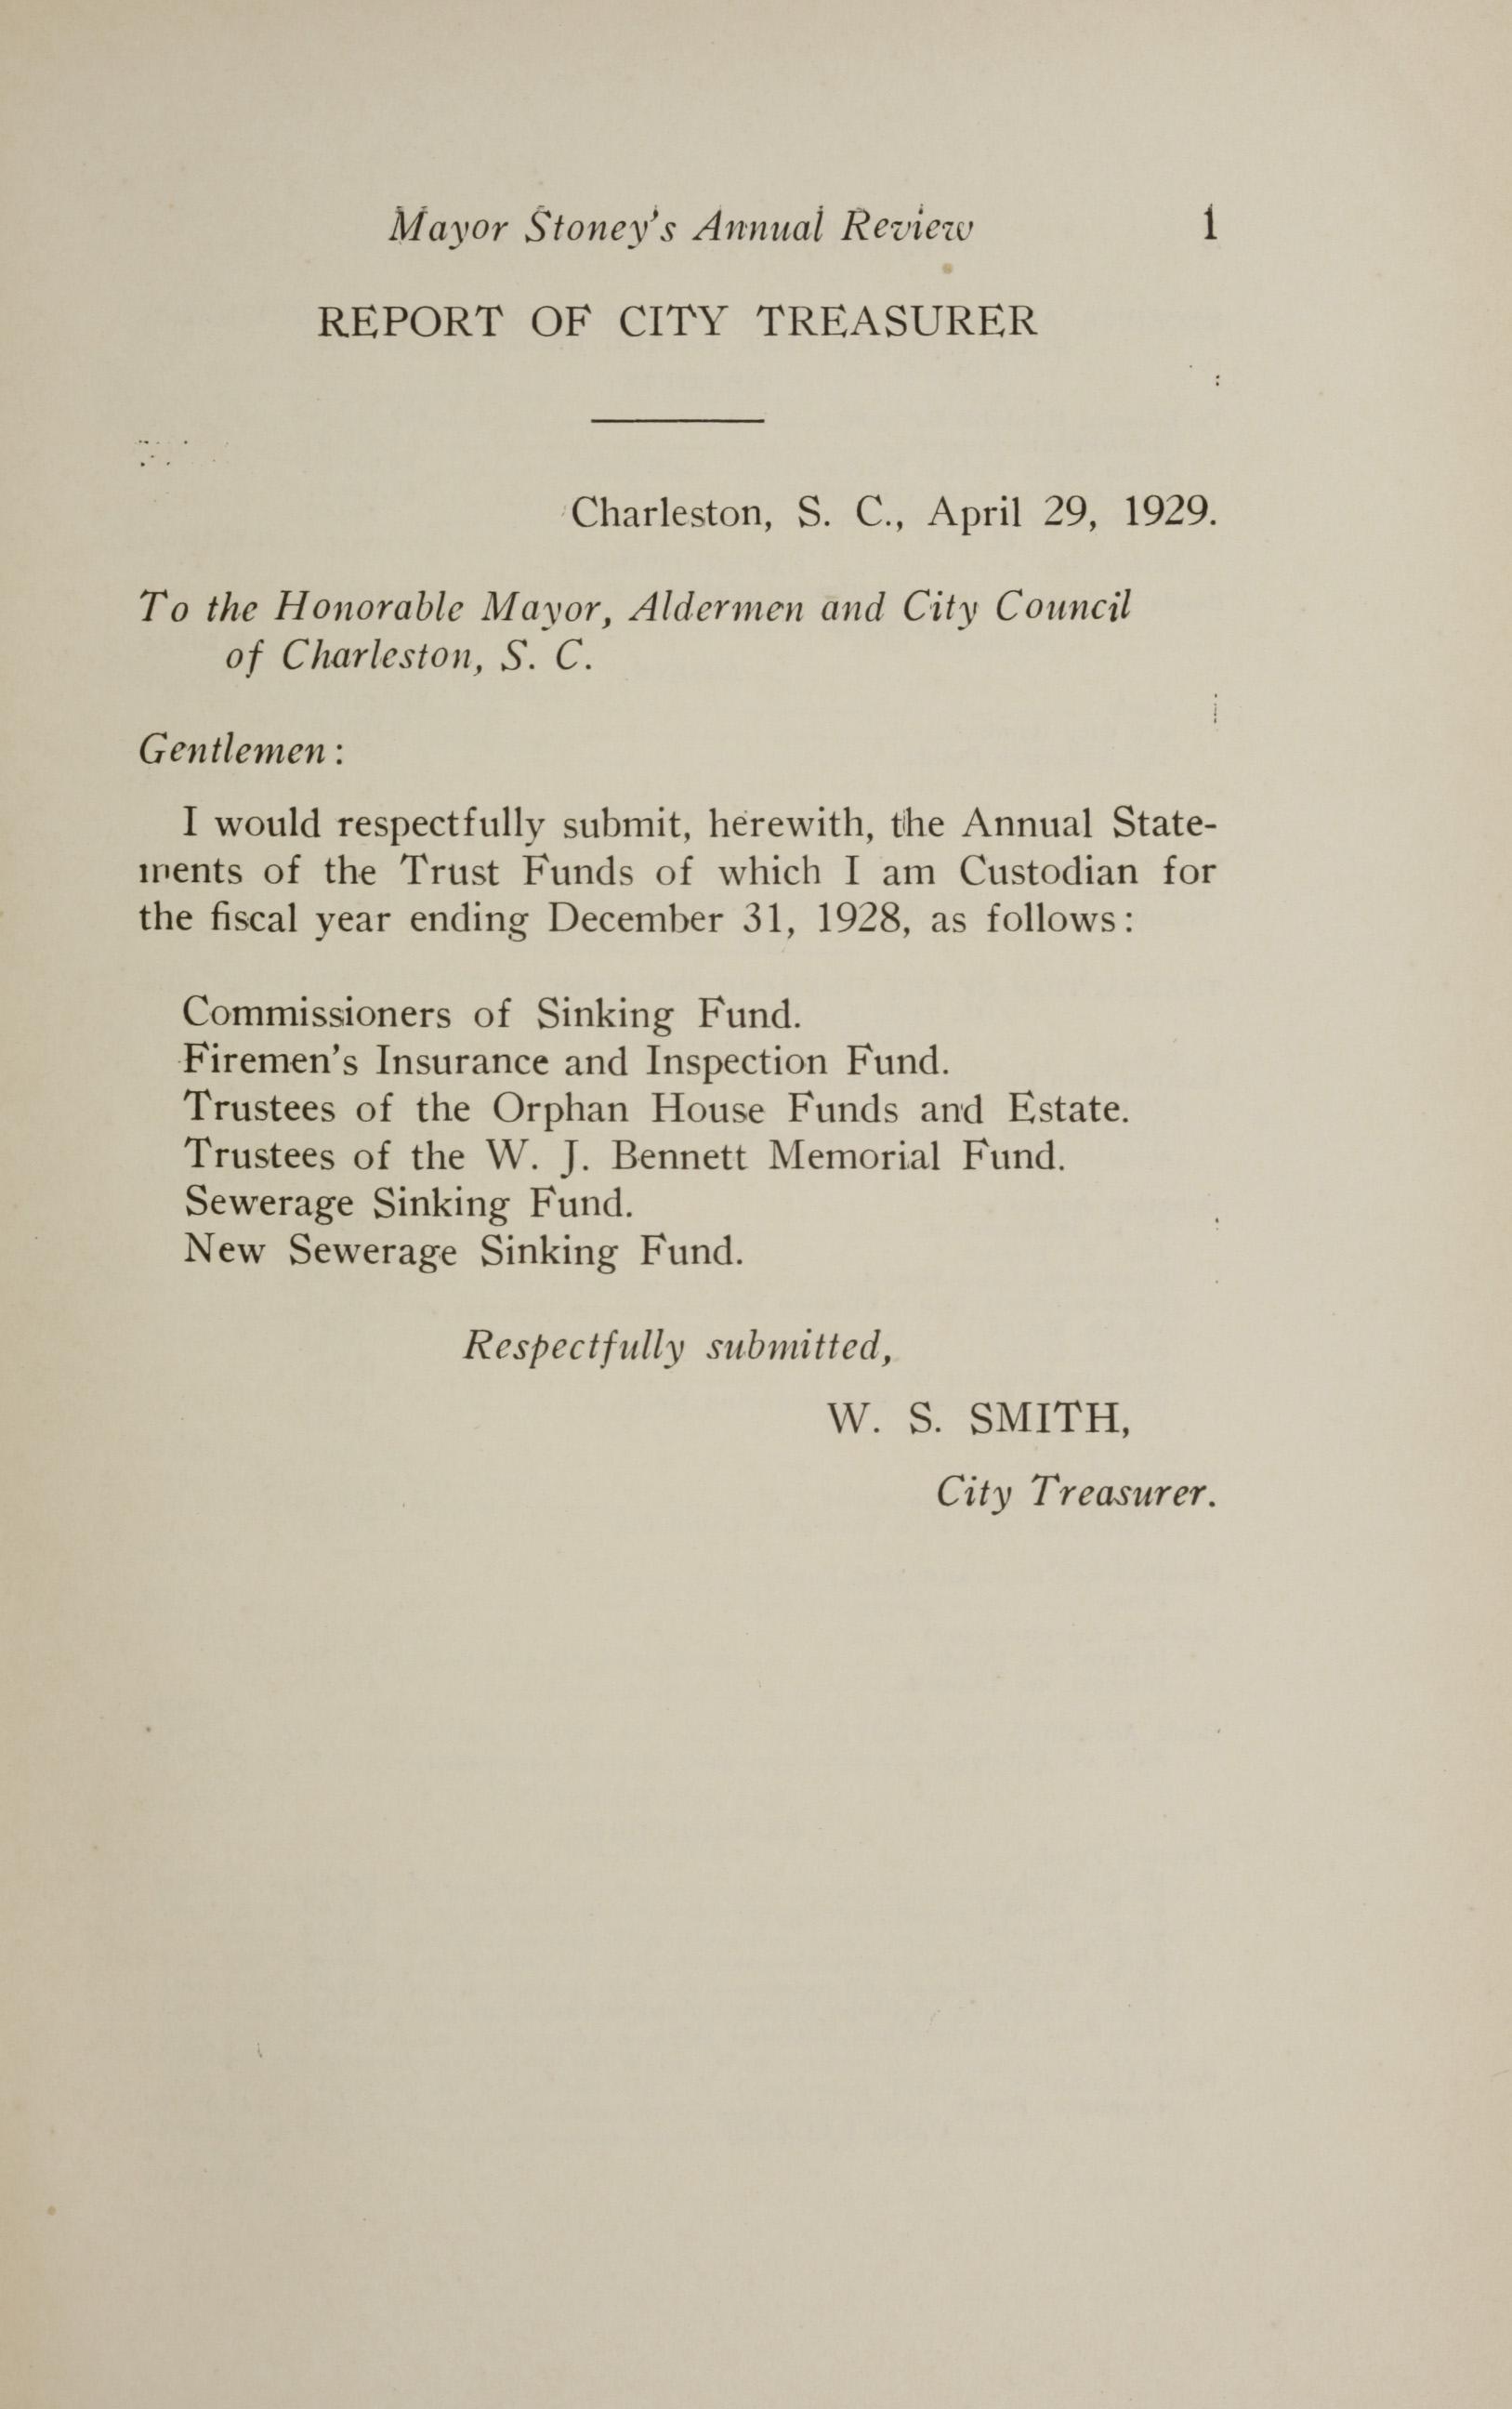 Charleston Yearbook, 1928, page 1